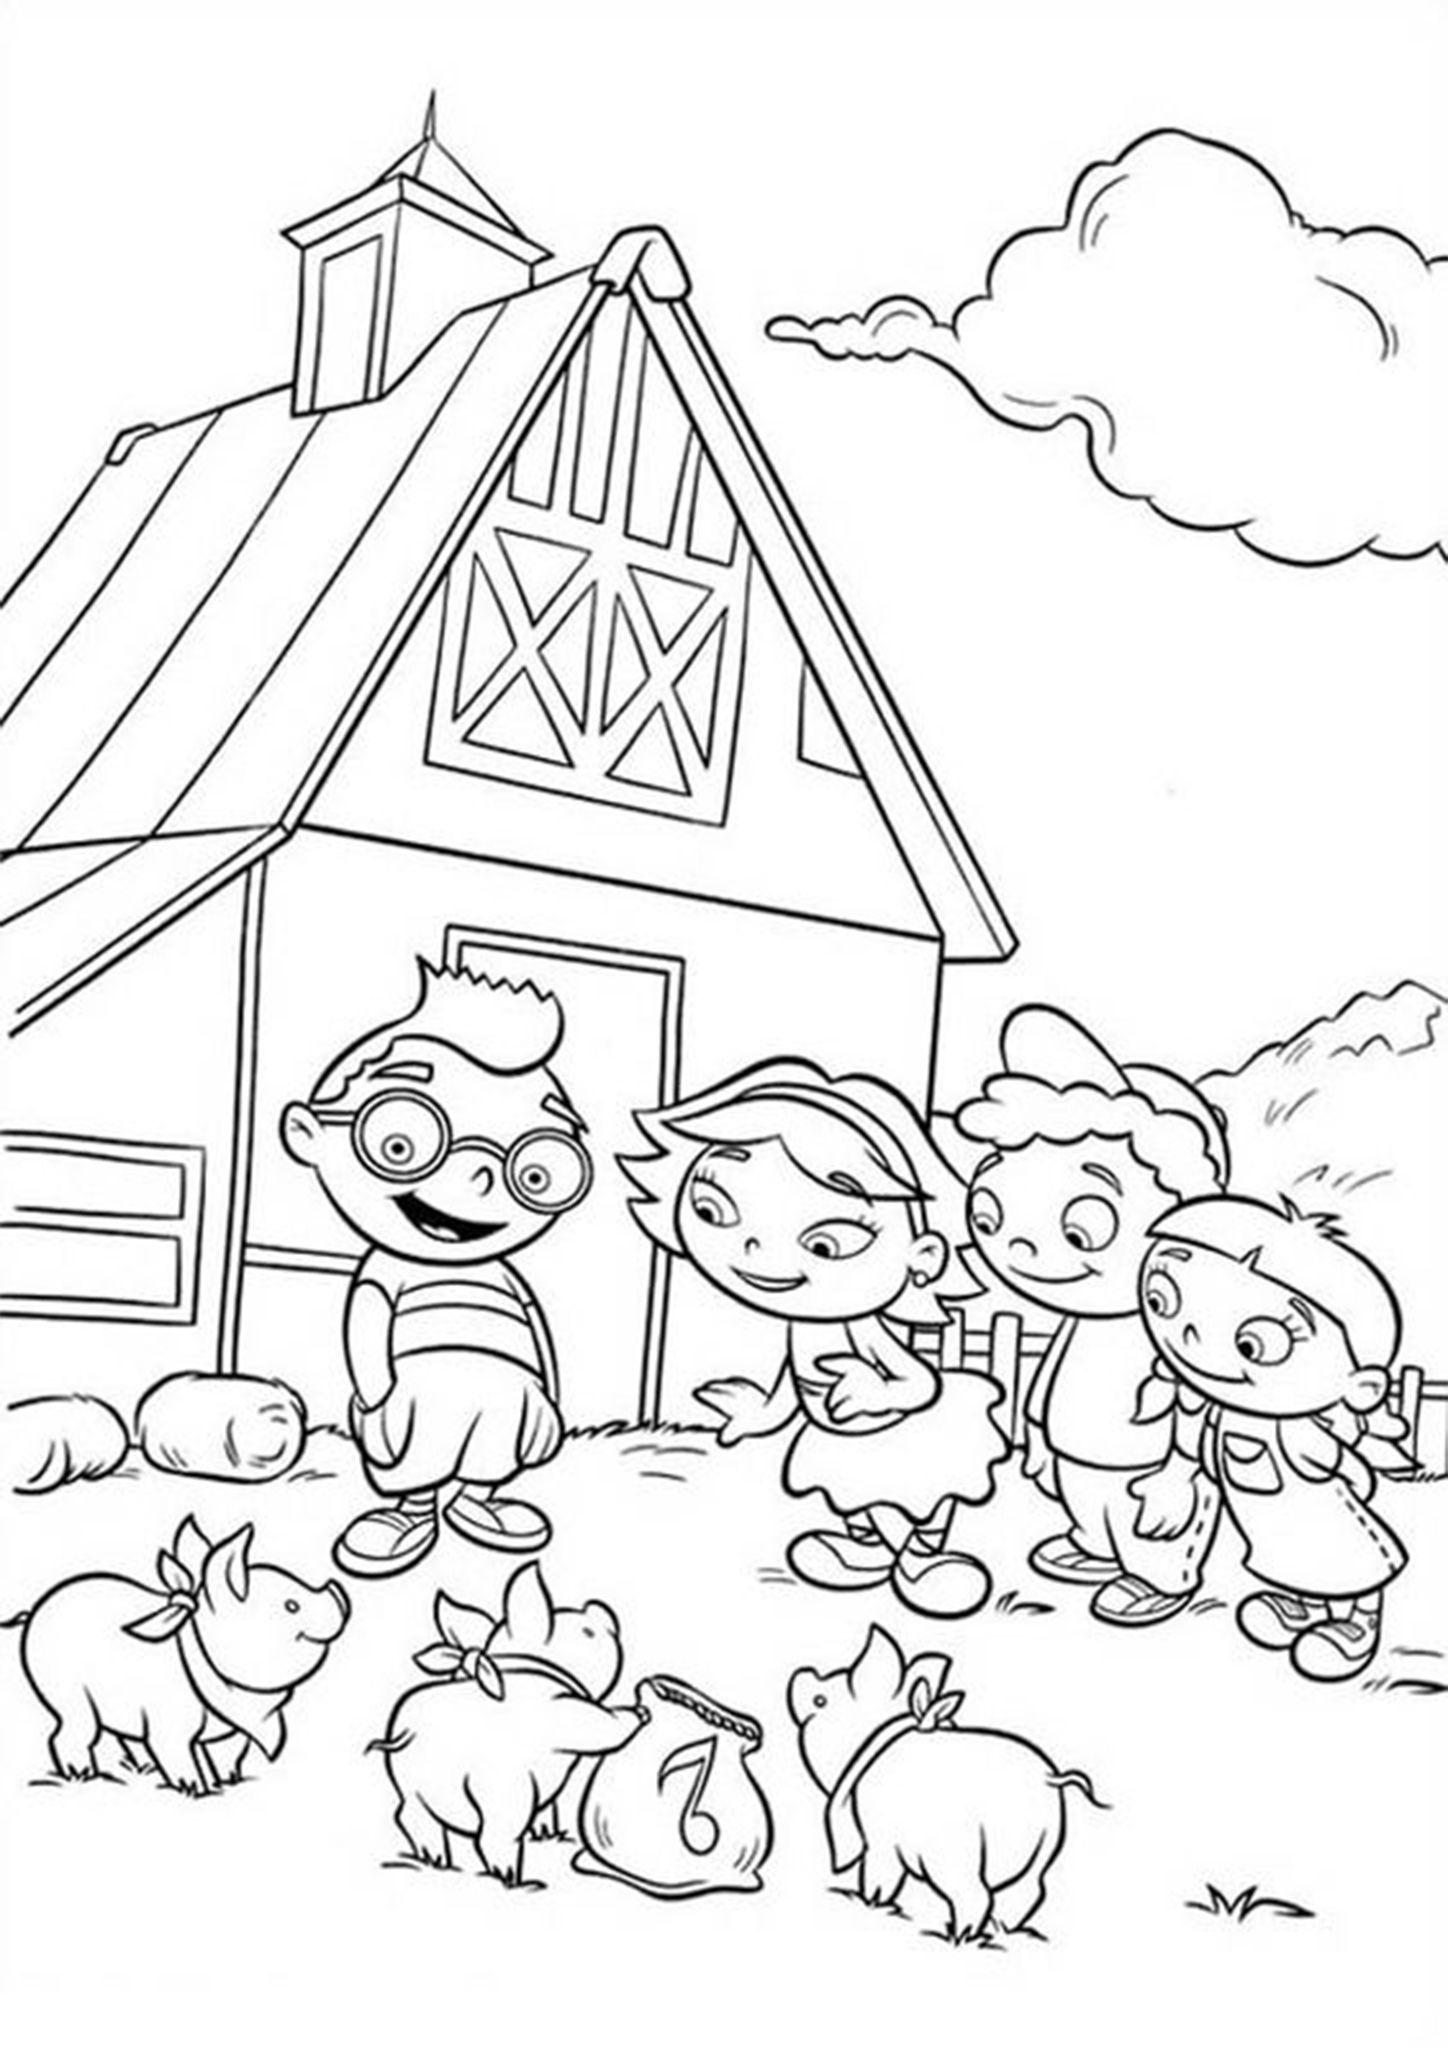 Free Easy To Print Farm Coloring Pages Farm Coloring Pages Dinosaur Coloring Pages Coloring Pages [ jpg ]